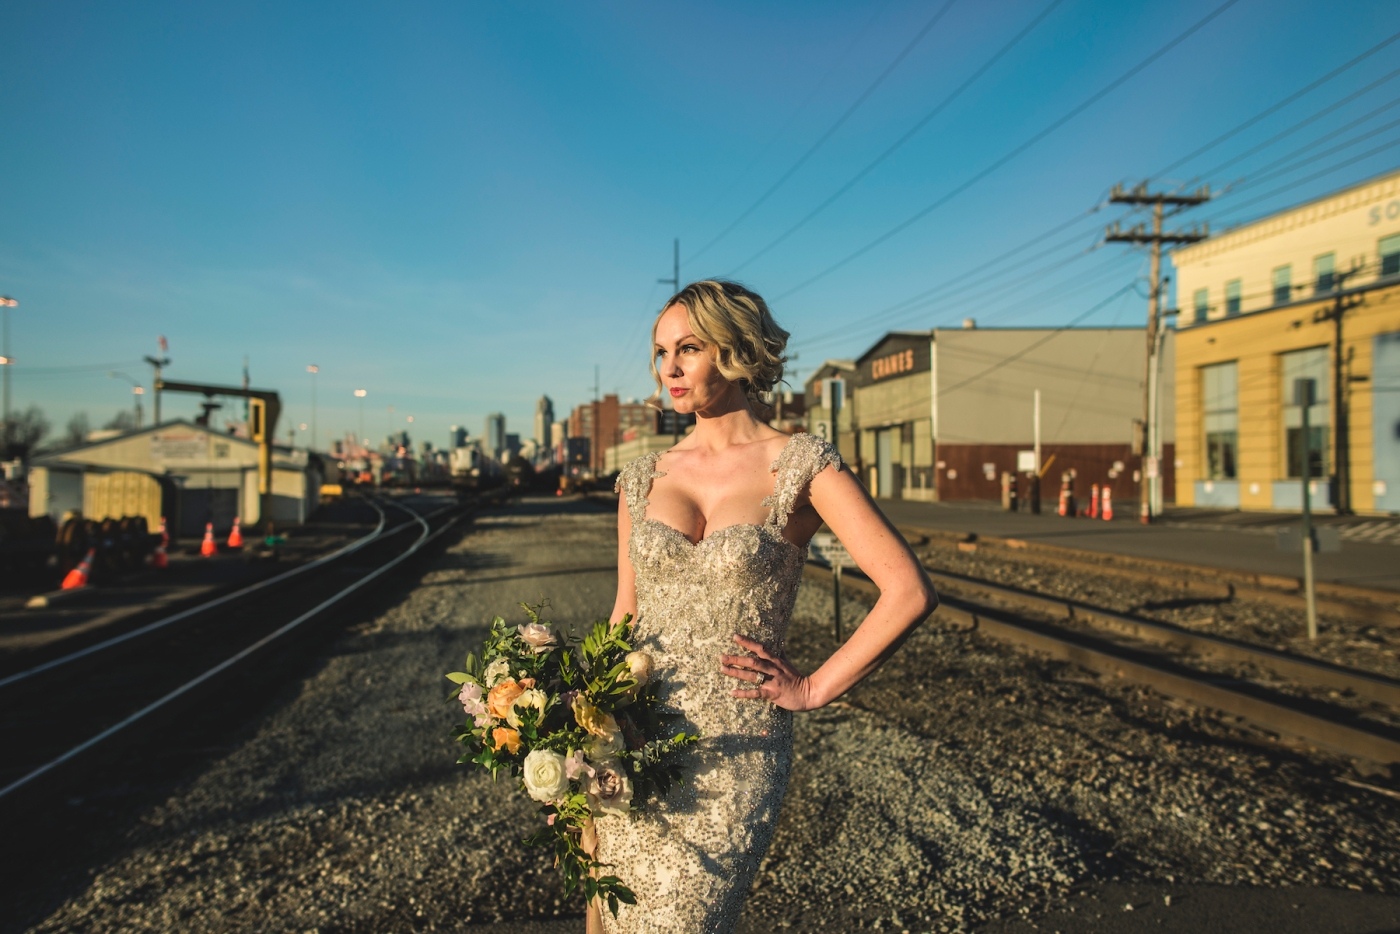 photography_by_jane_speleers_2017_wedding_show_i_do_sodo_within_designed_by_melody_davisdsc_0714-2